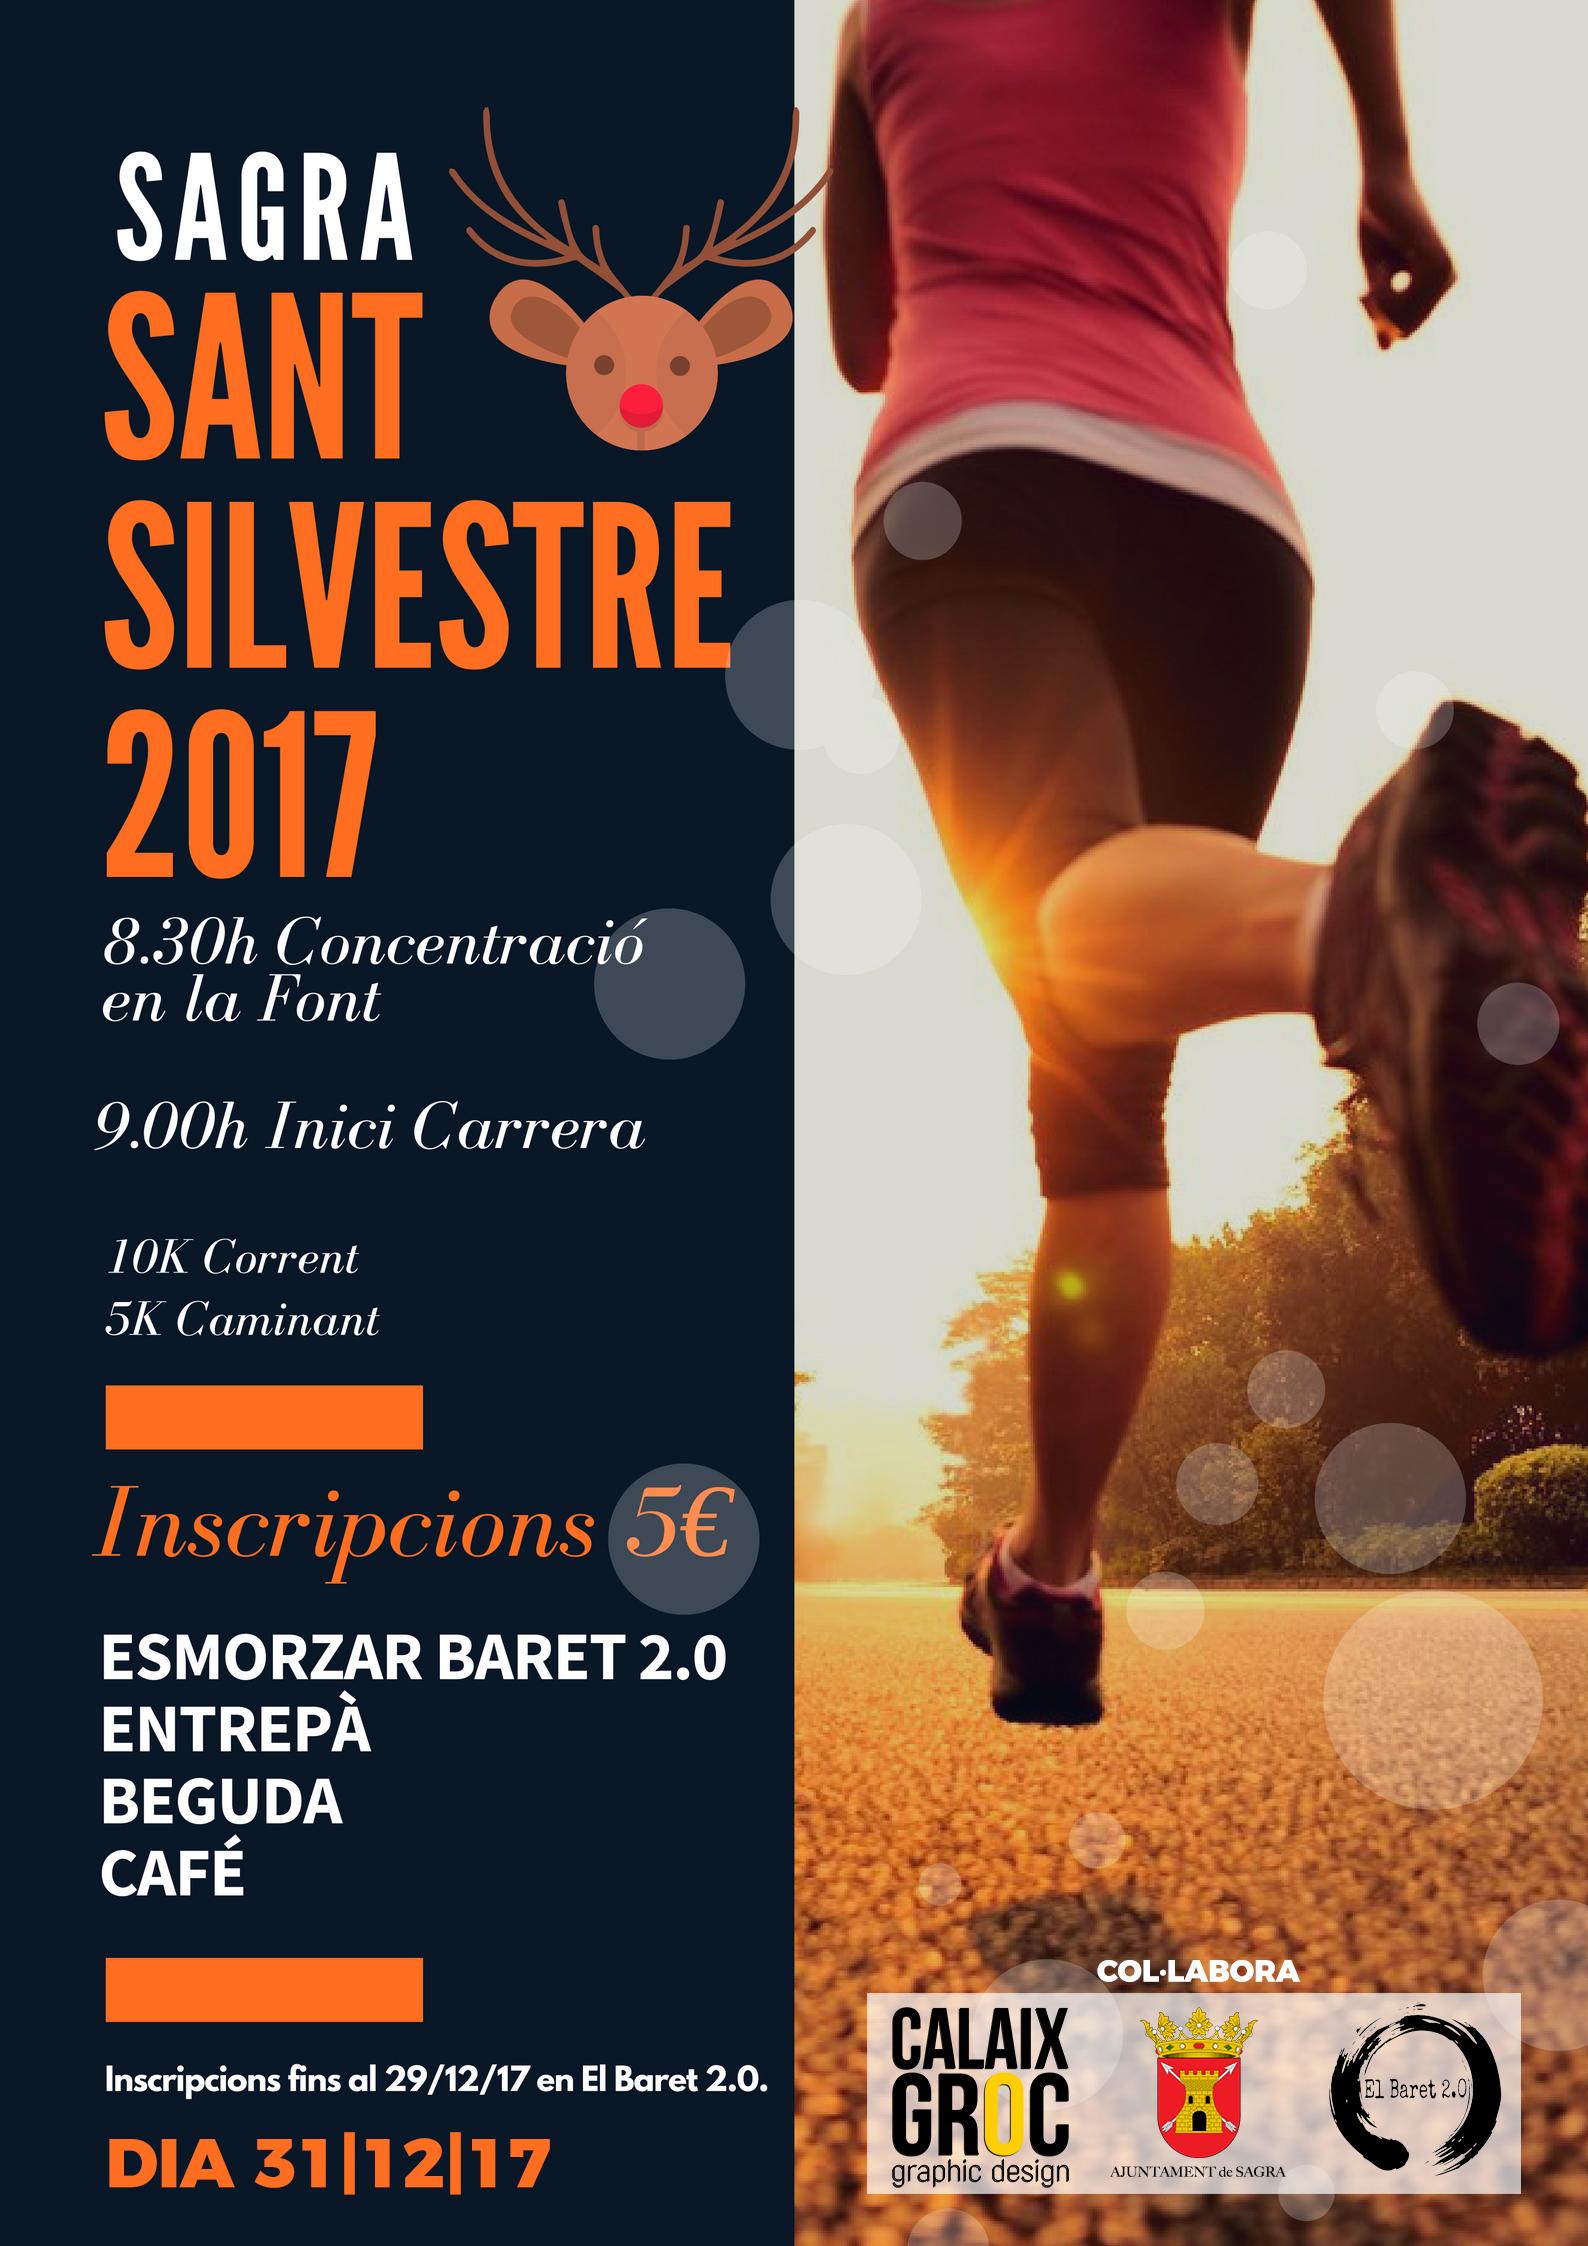 Sant silvestre2017-sagra-ELCALAIXGROC